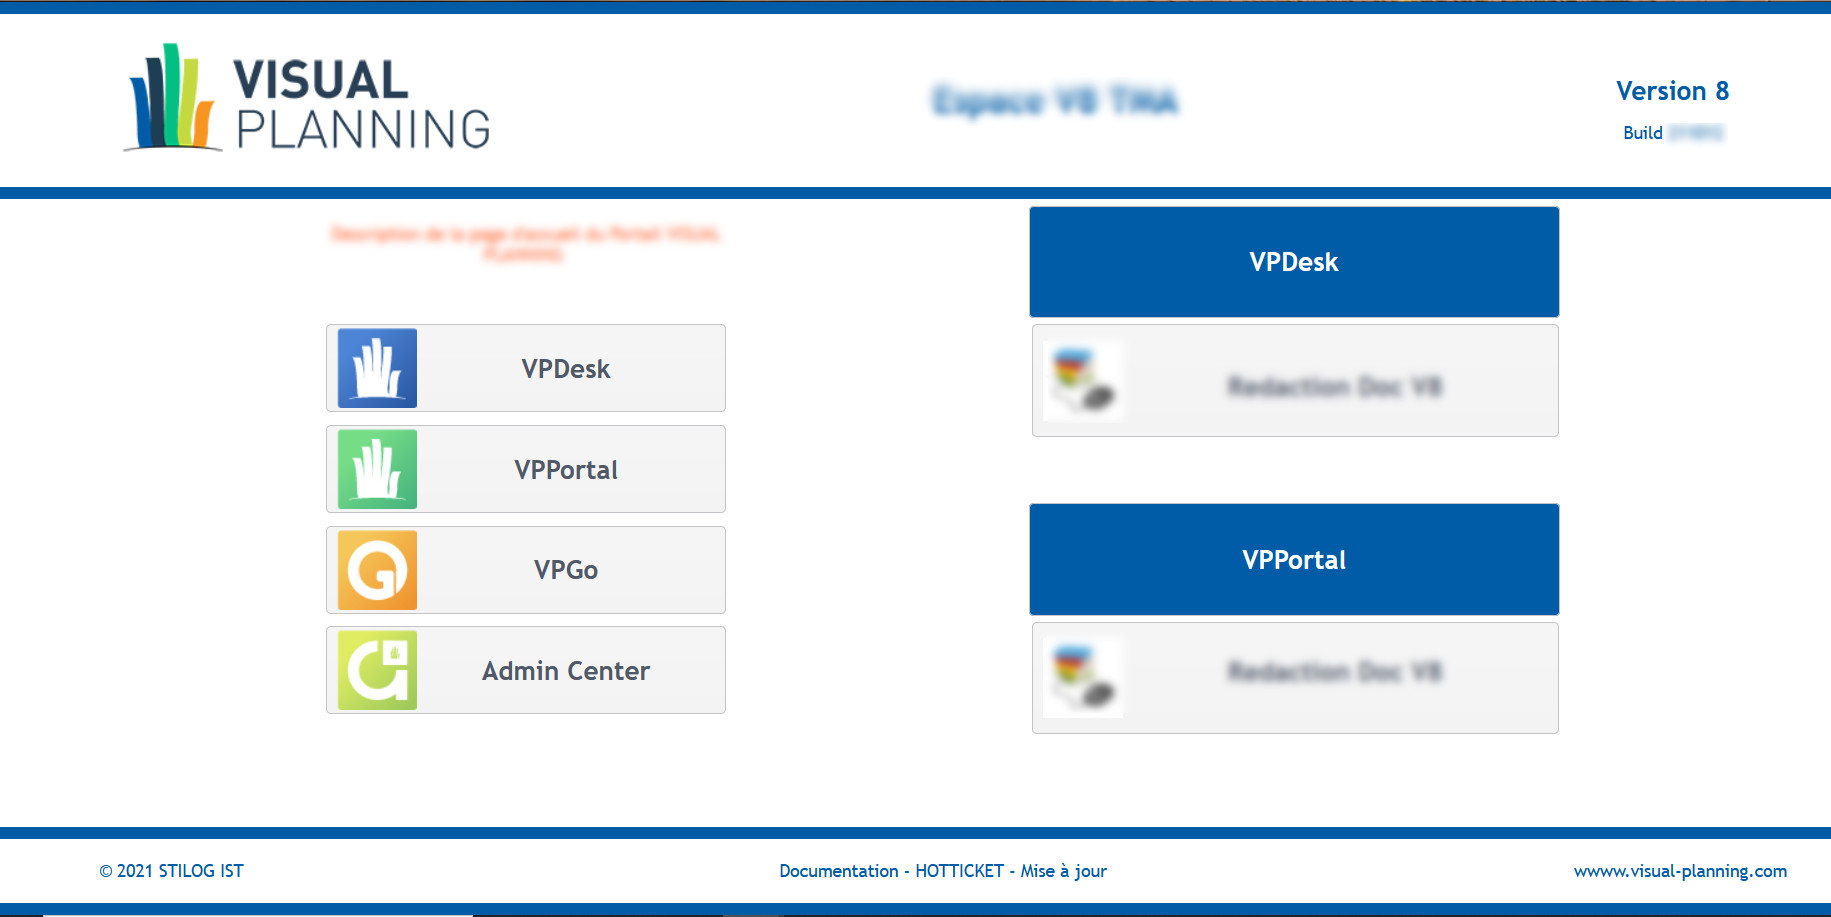 visual planning portal